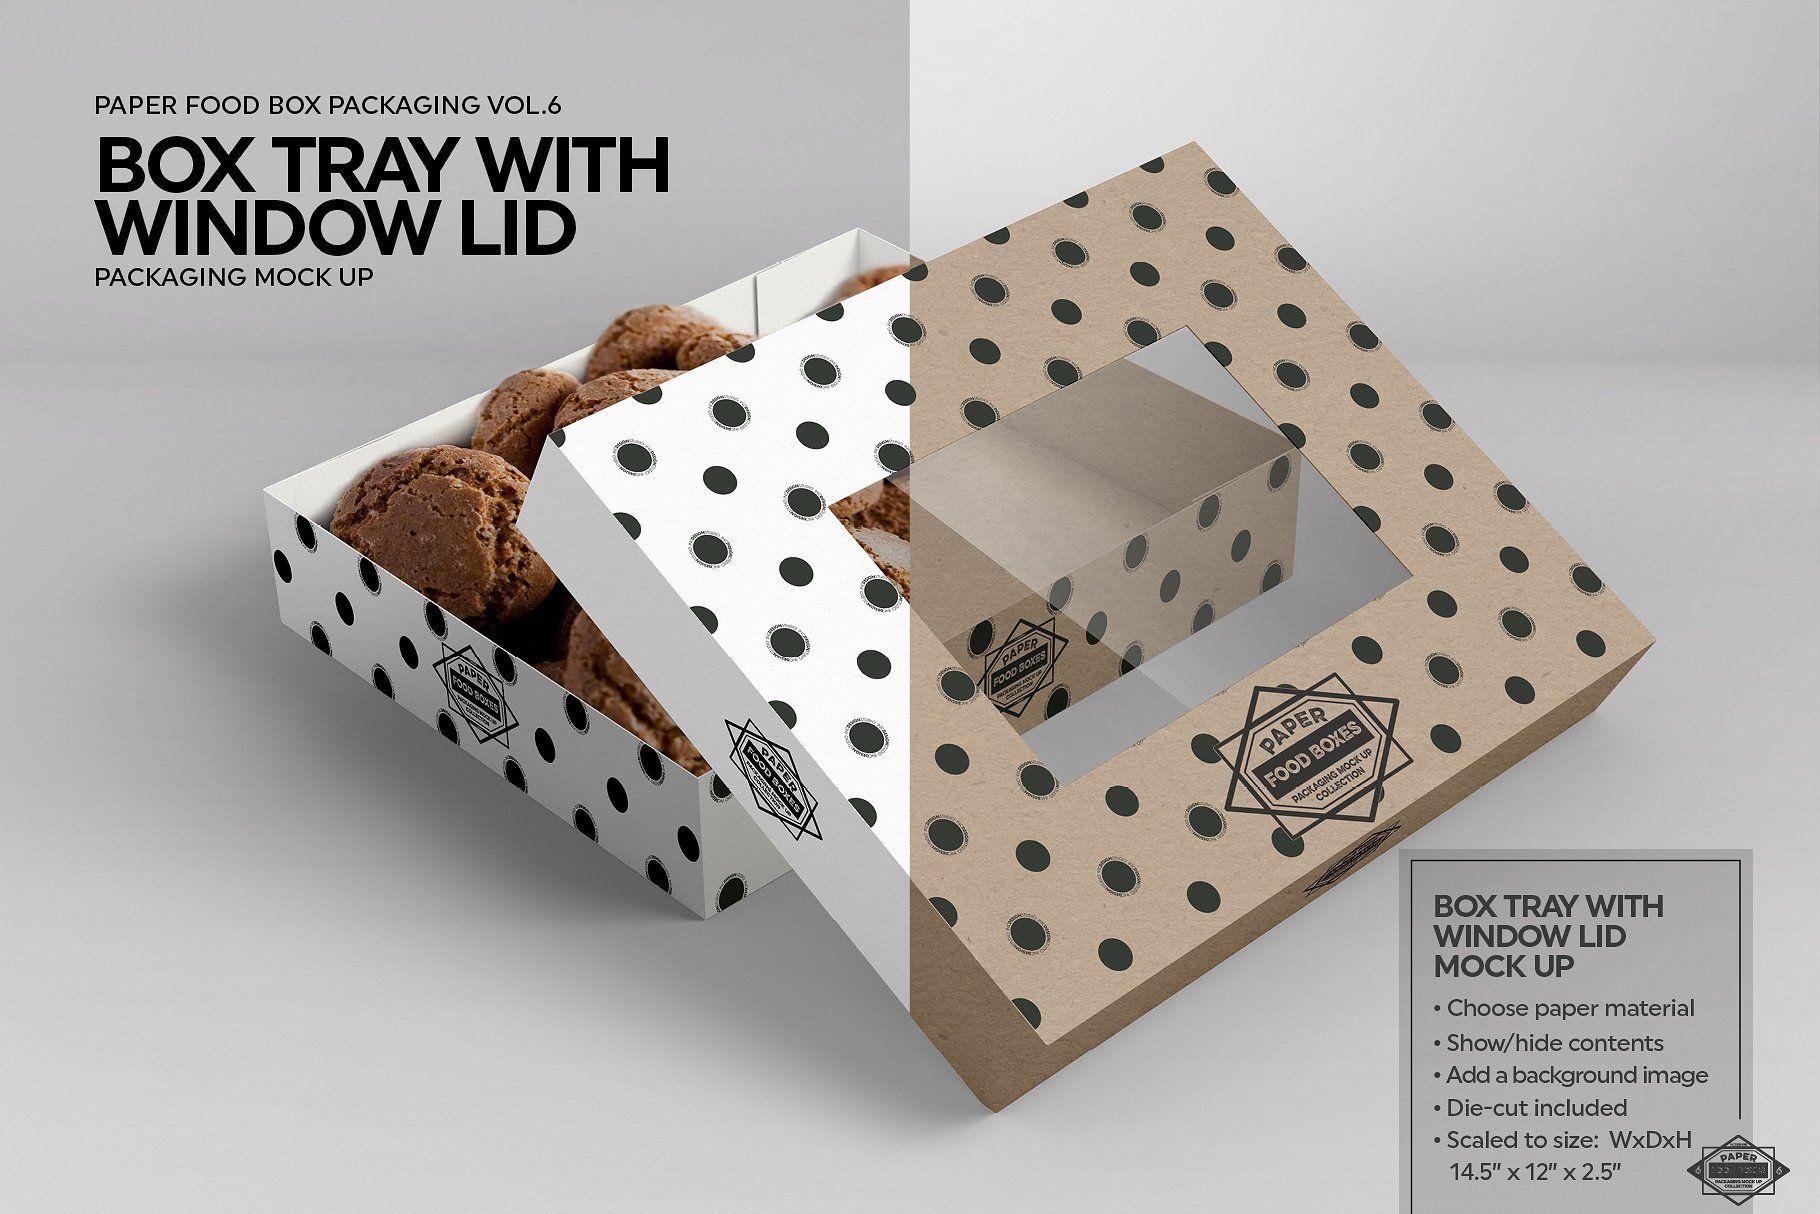 Download Box Tray Window Lid Packaging Mockup Food Box Packaging Packaging Mockup Recipe Box